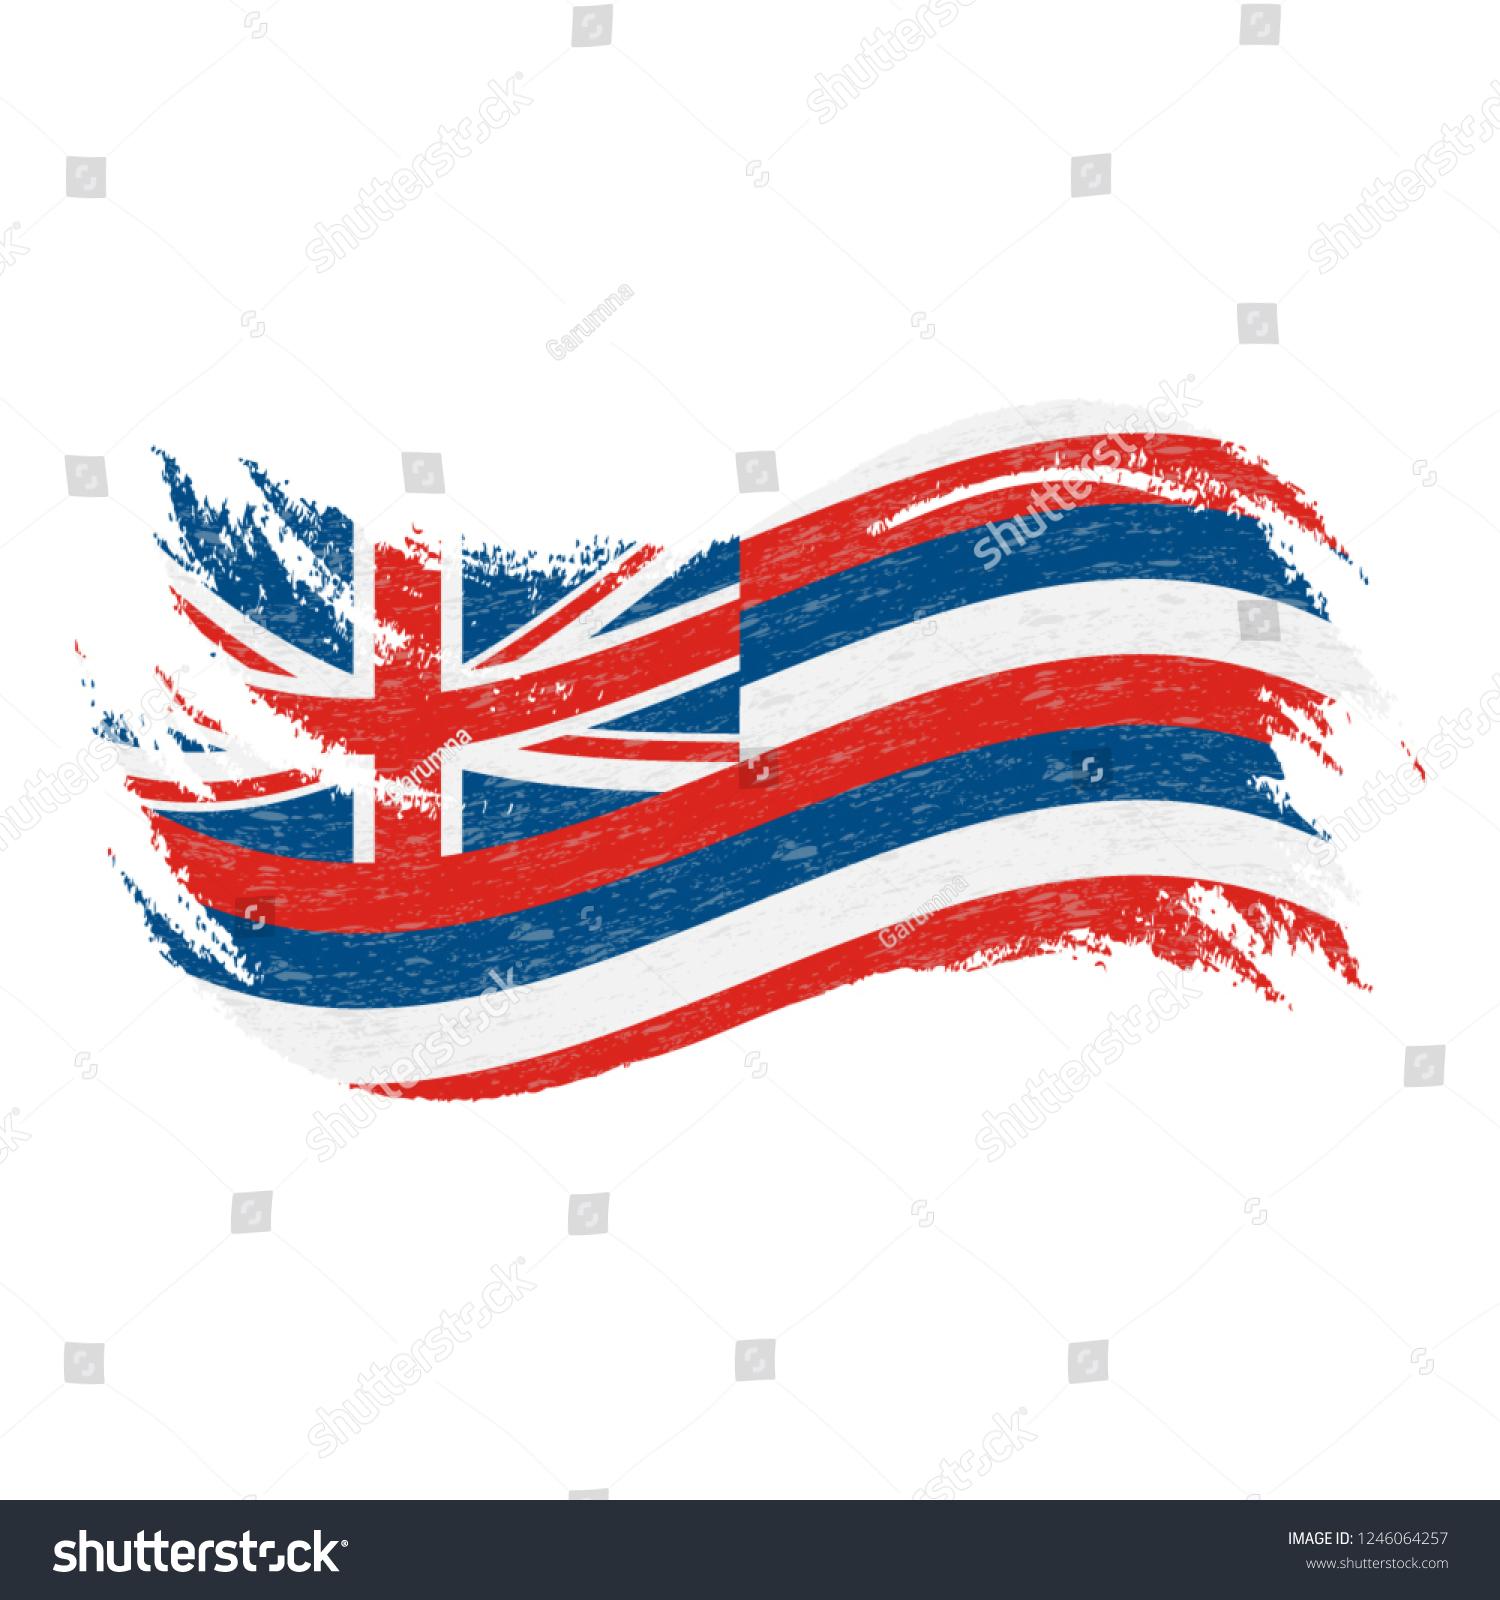 5 pies IUwnHceE Bandera del Estado de Hawaii pr/áctica de la Bandera Polo Durable de la Bandera de Hawaii Ojal port/átil de Metal para el Festival de Actividades 3